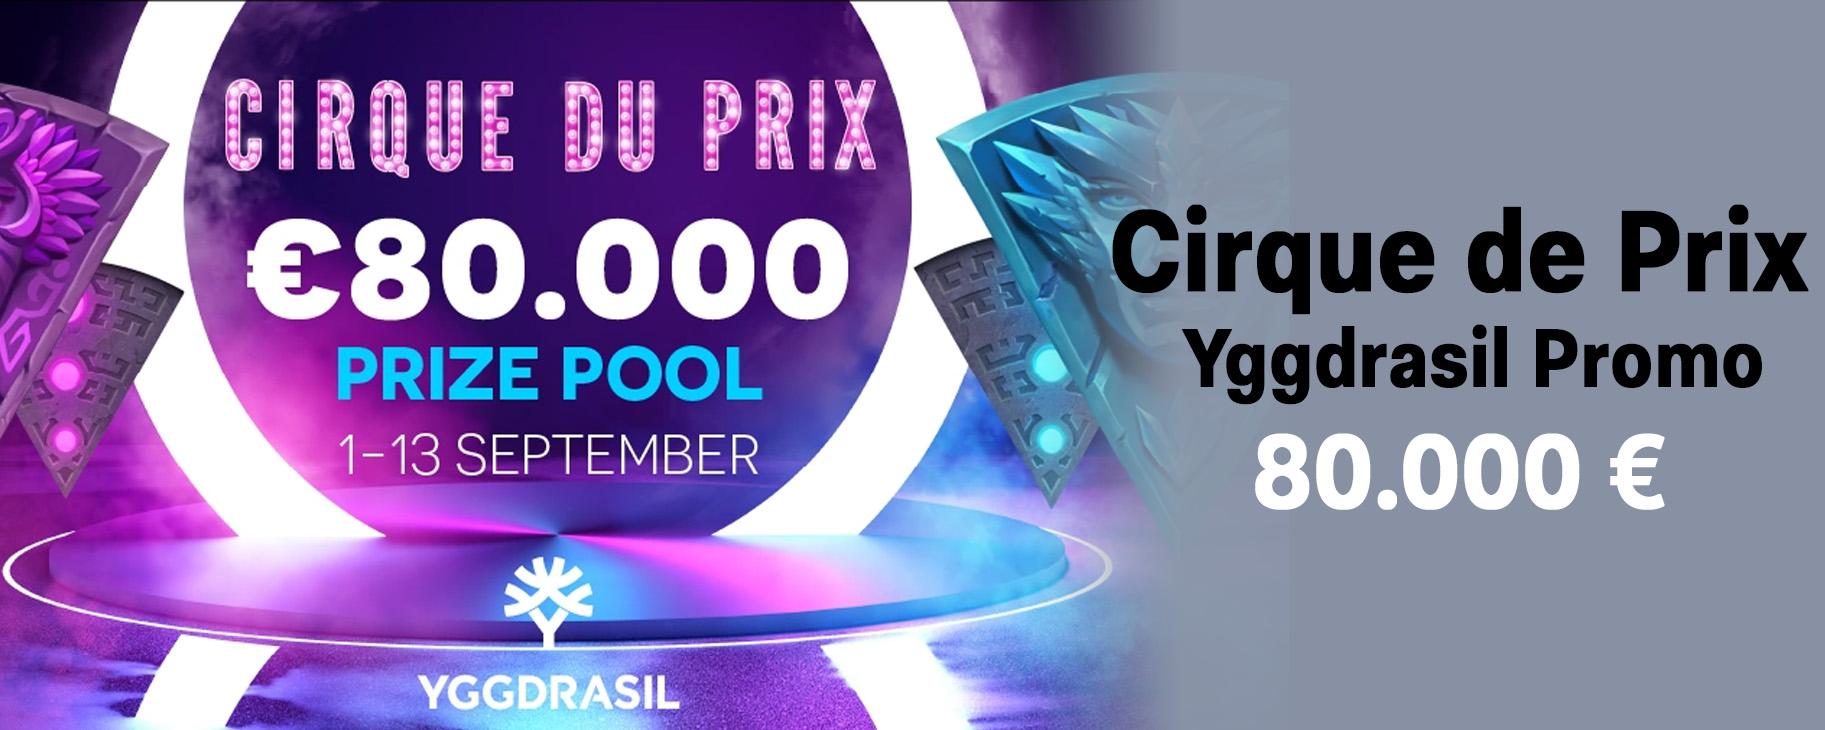 Yggdrasil Cirque de Prix – Der 80.000 € Zirkus